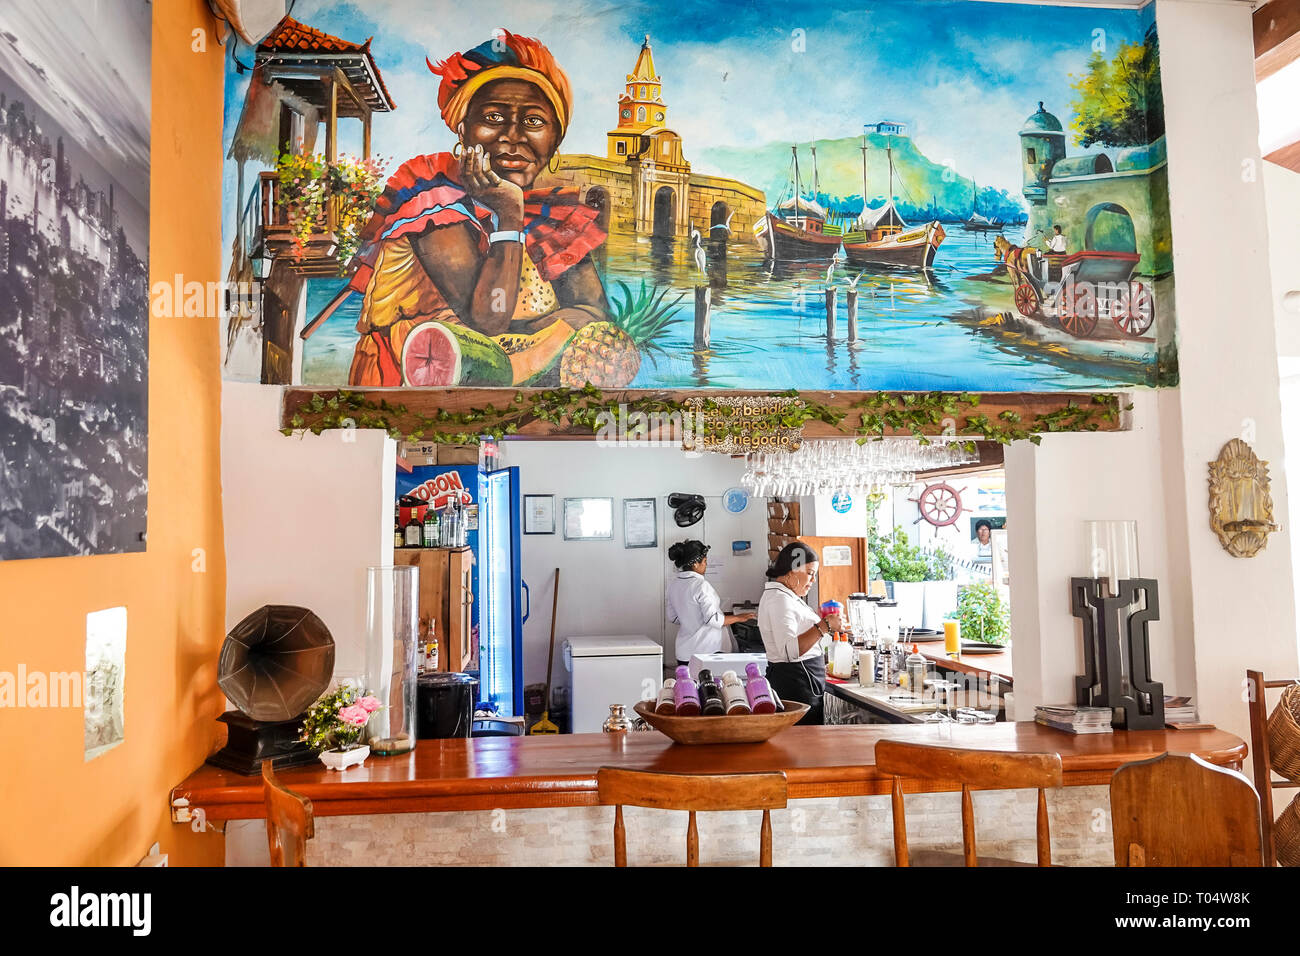 Colombia, Cartagena, Old Walled City Center centre, San Diego, Hispanic Hispanics Latin Latino Latinos ethnic ethnics immigrant immigrants minority mi Stock Photo